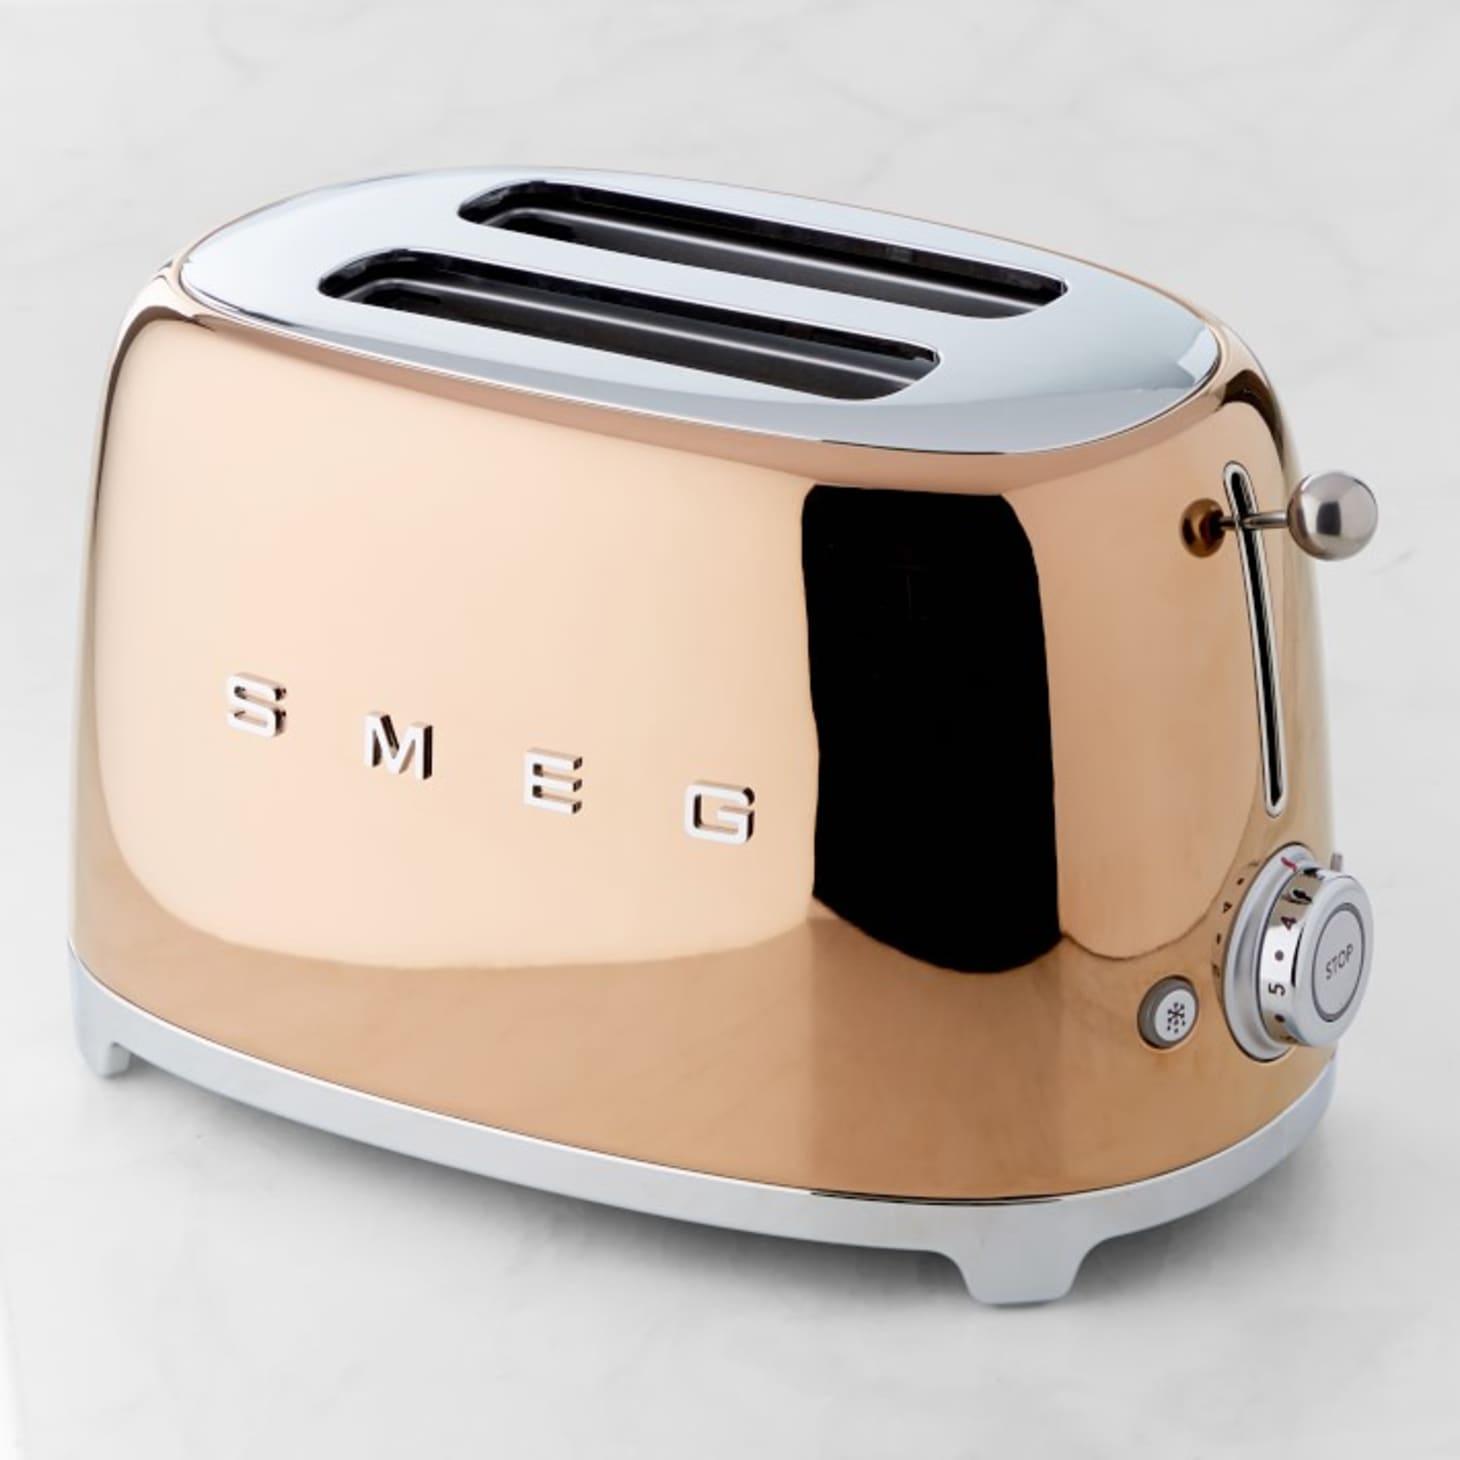 SMEG Rose Gold Kitchen Appliances